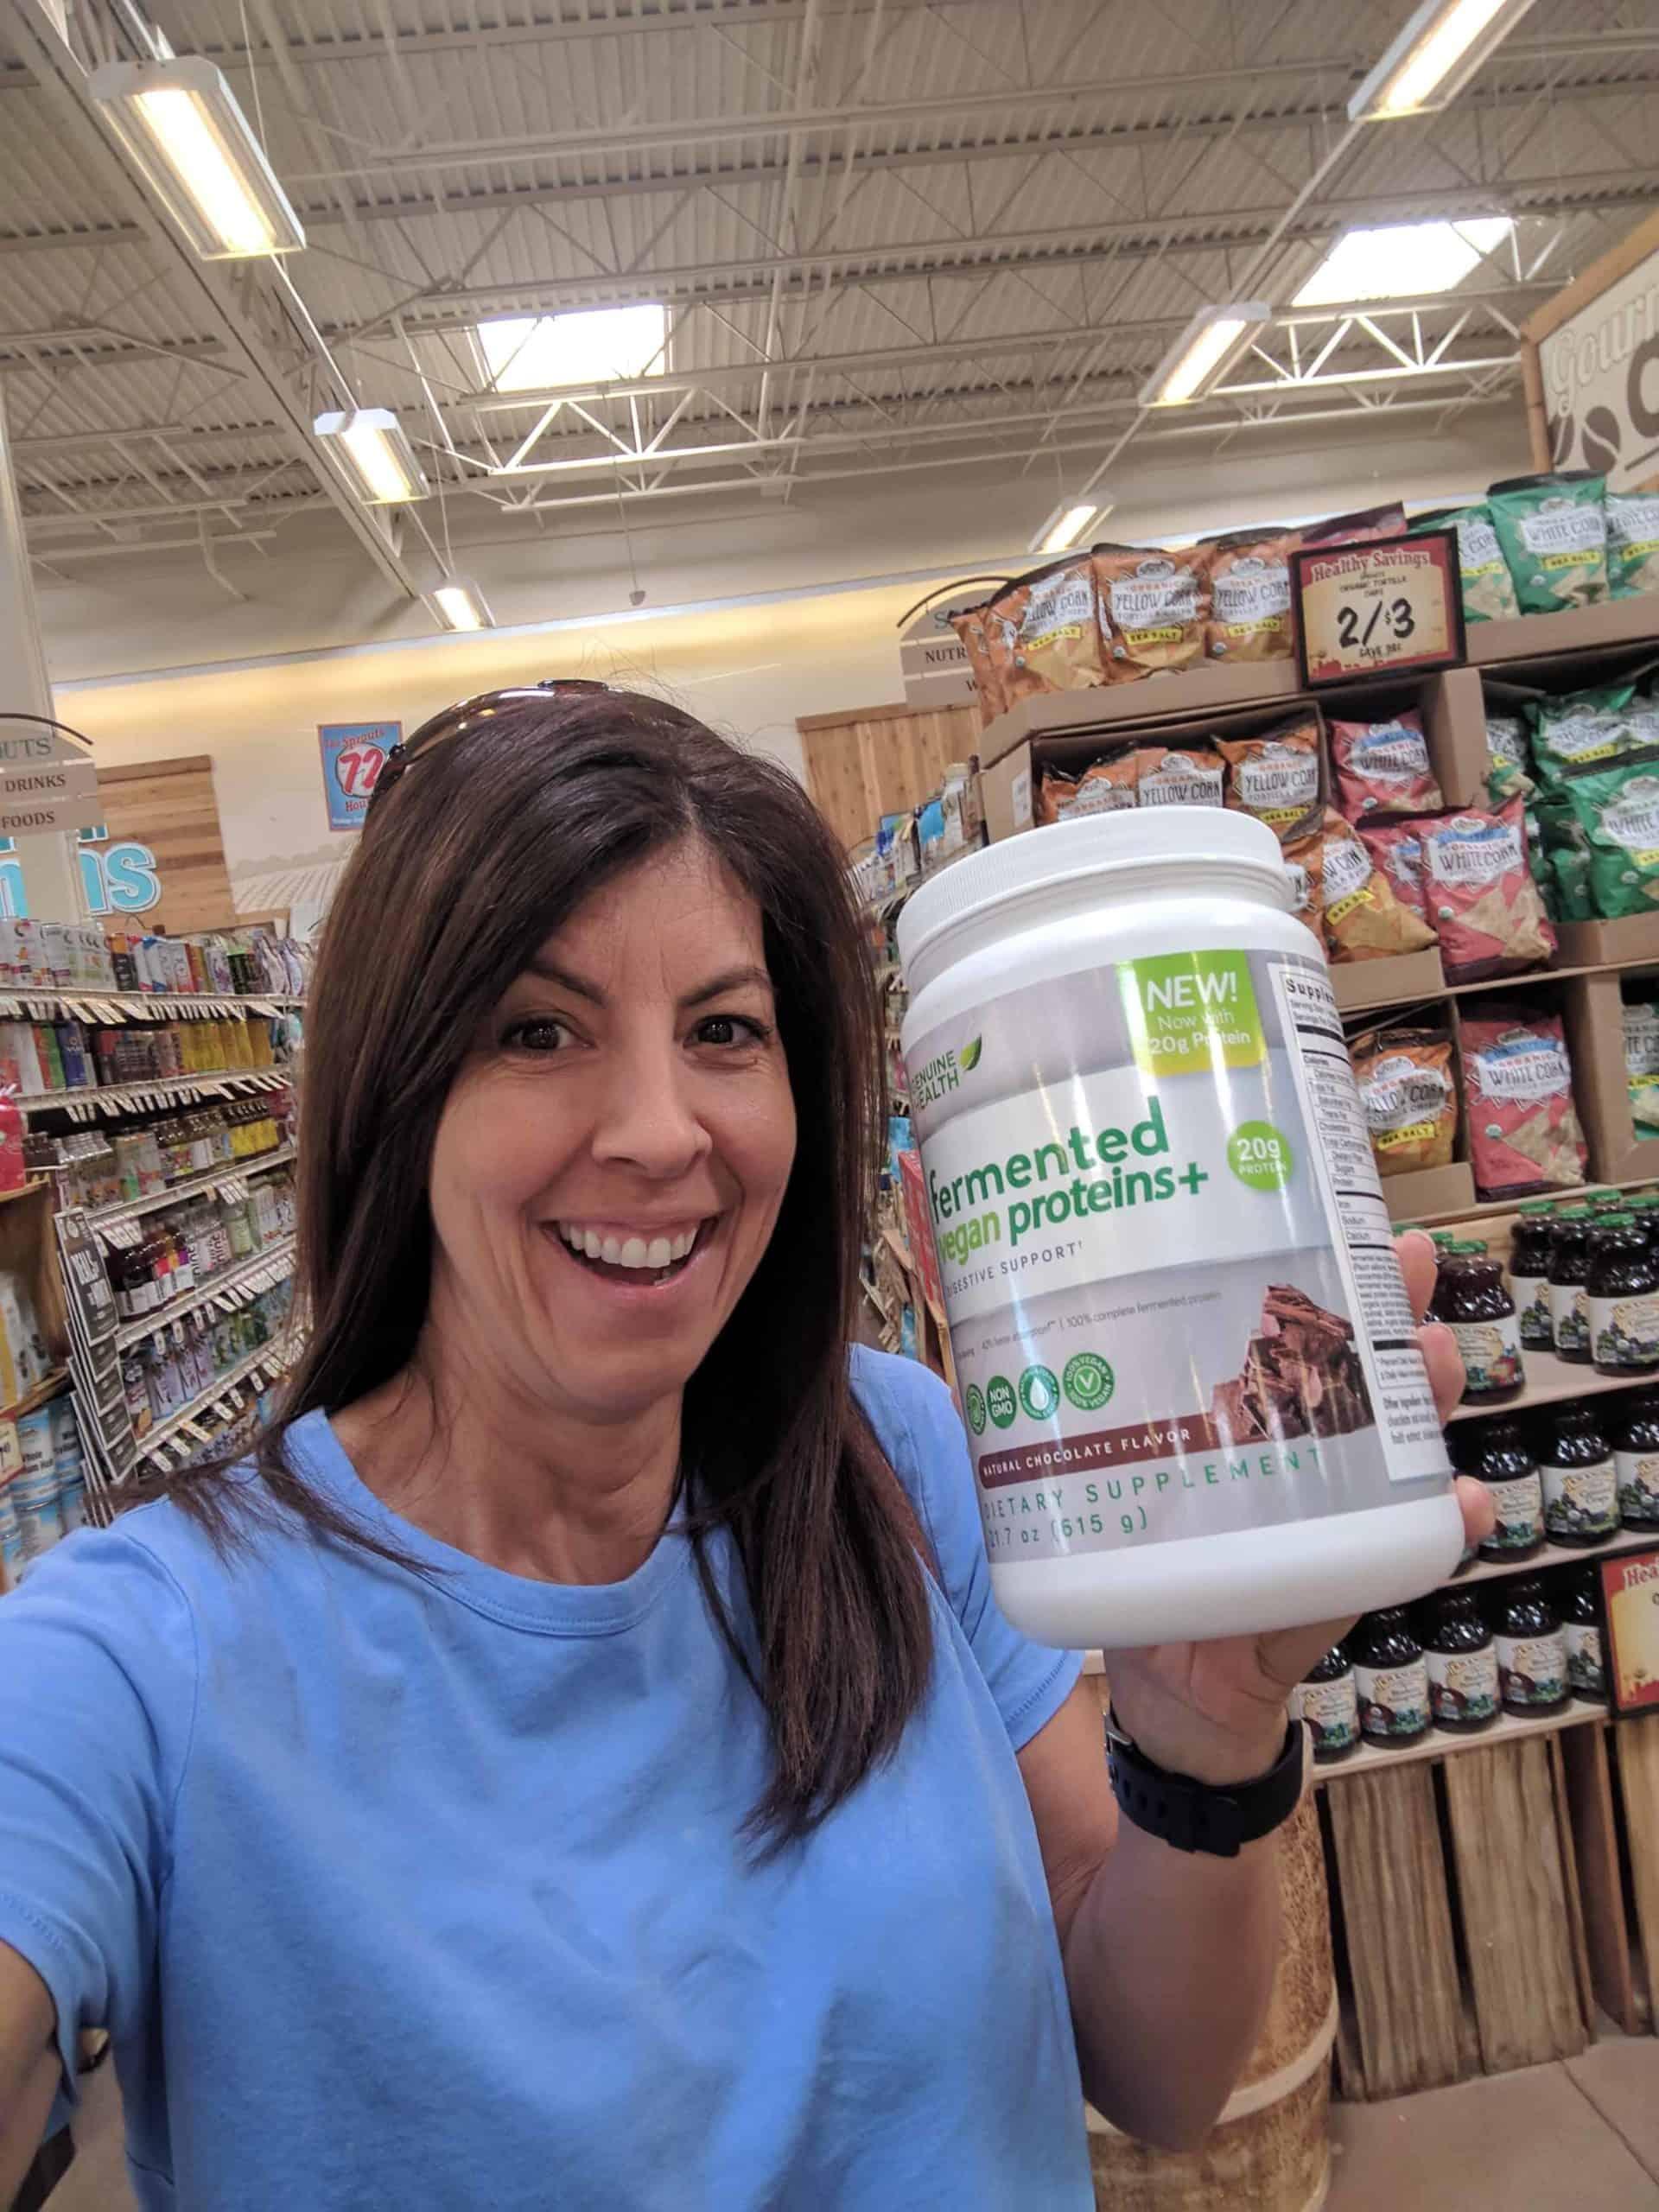 fermented vegan proteins+